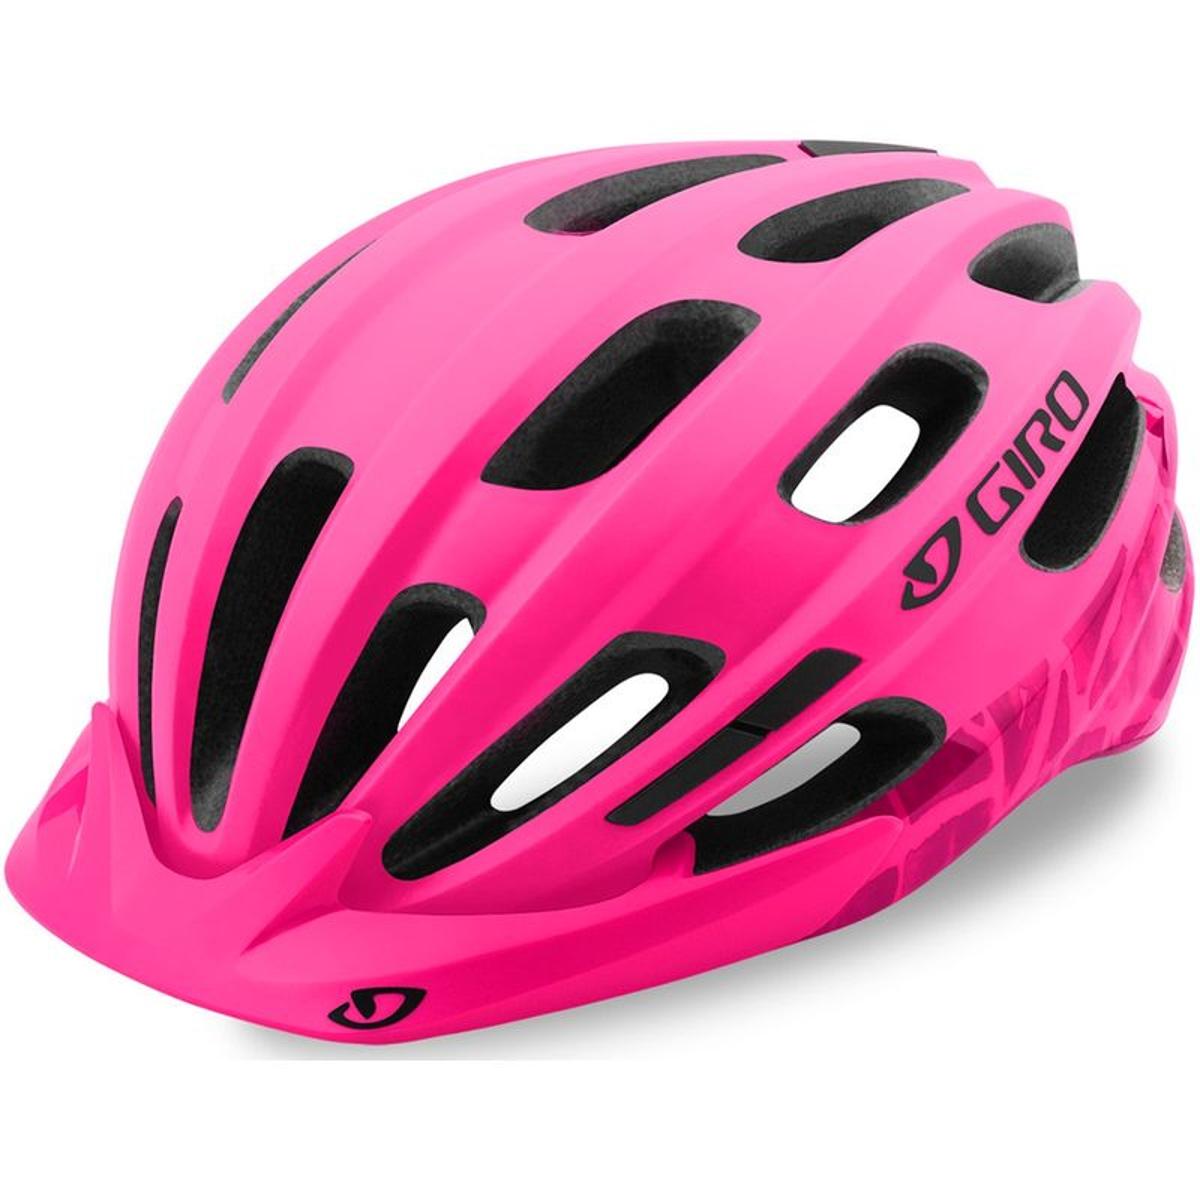 Vasona MIPS - Casque de vélo Femme - rose